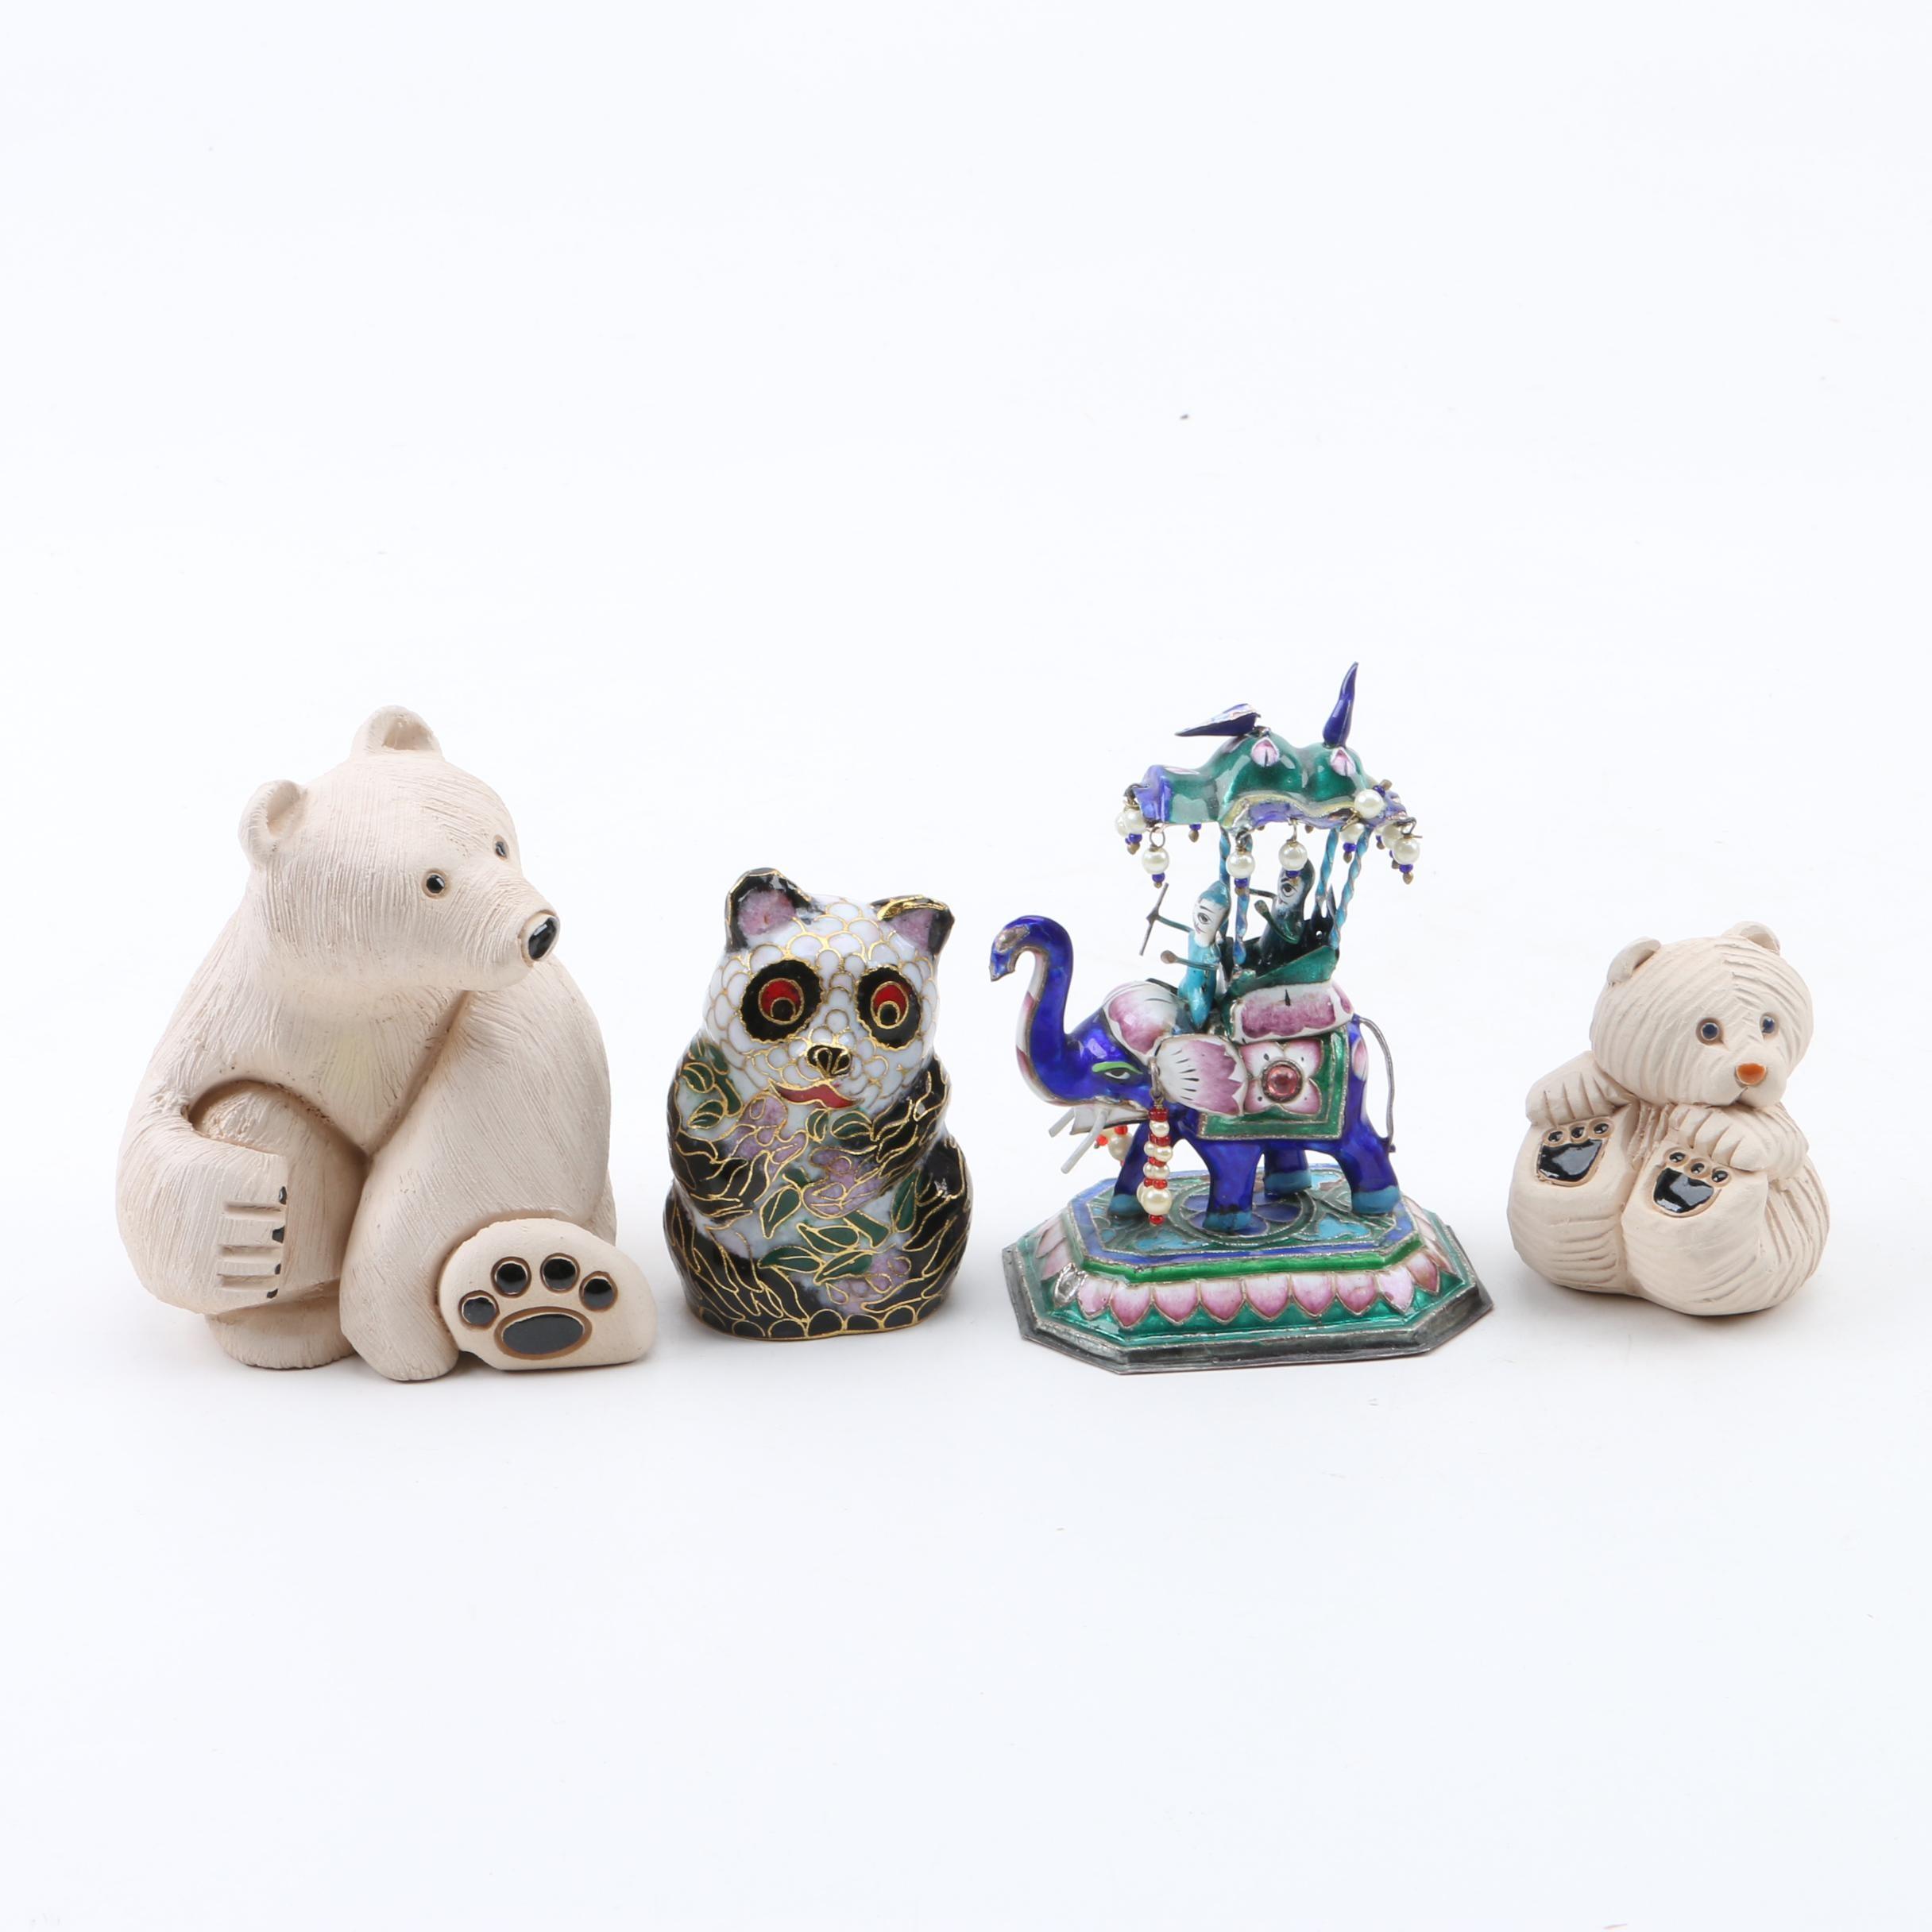 Ceramic and Porcelain Animal Figurines